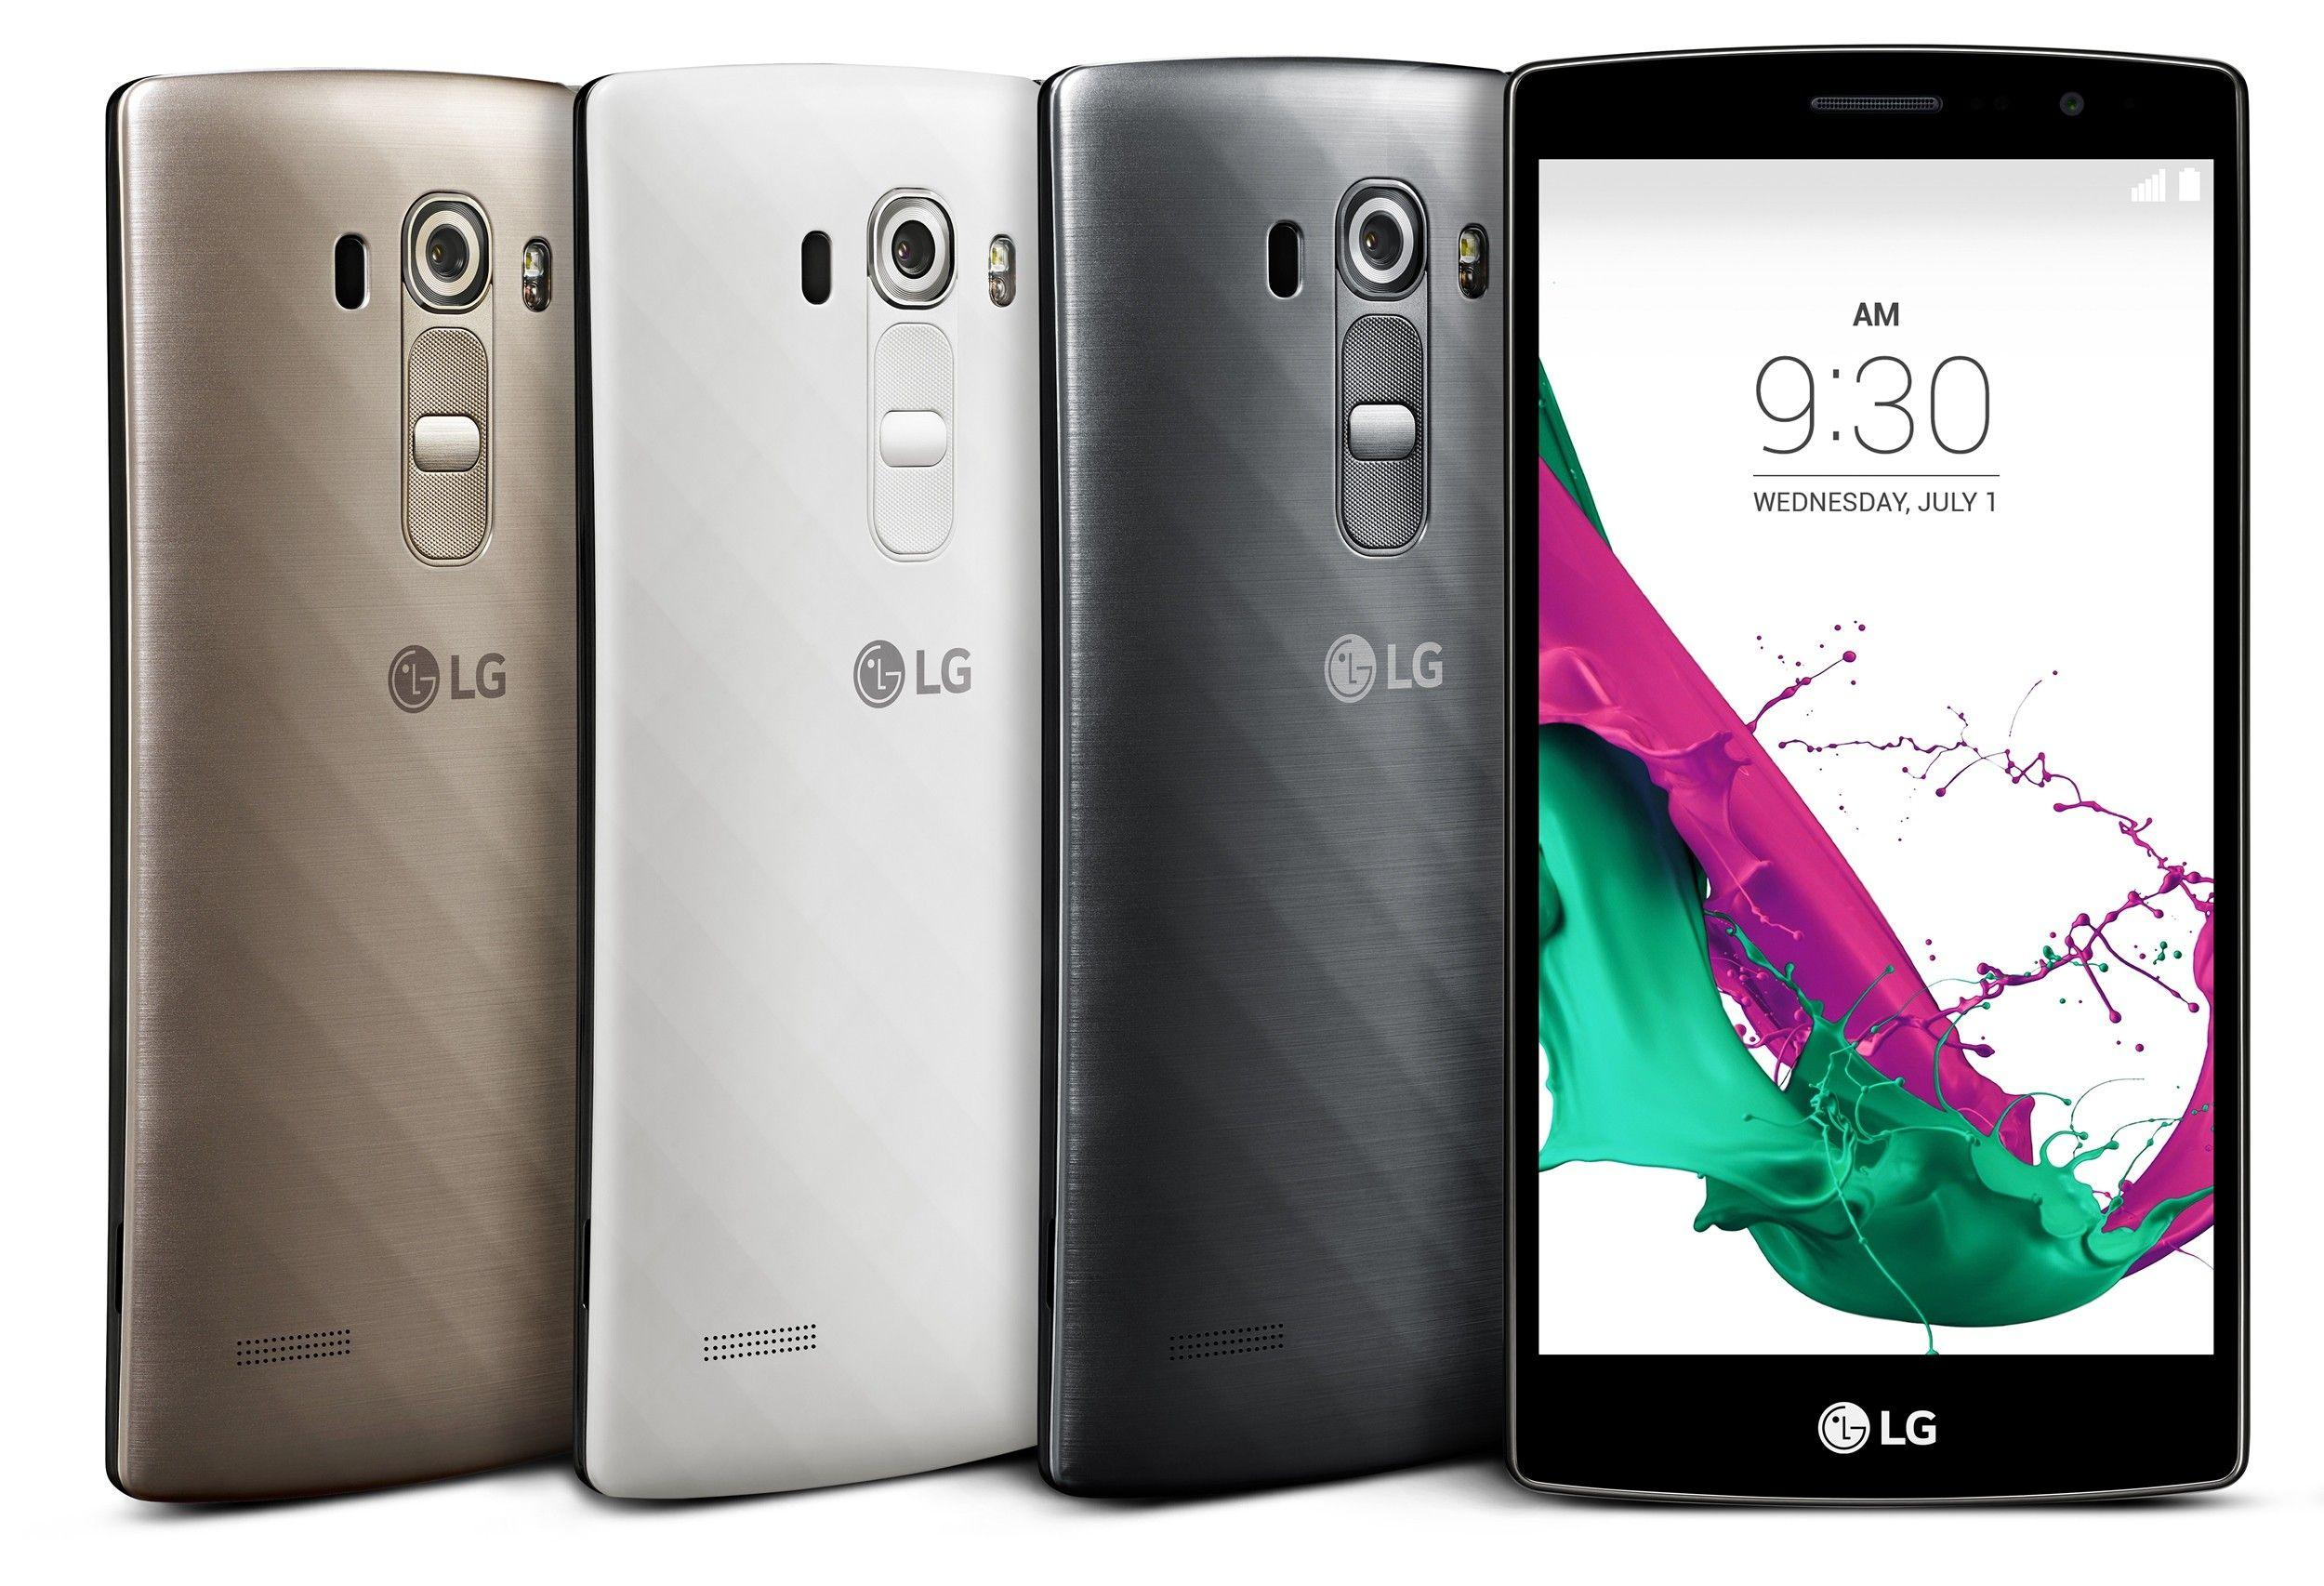 LG-G4s-render-2